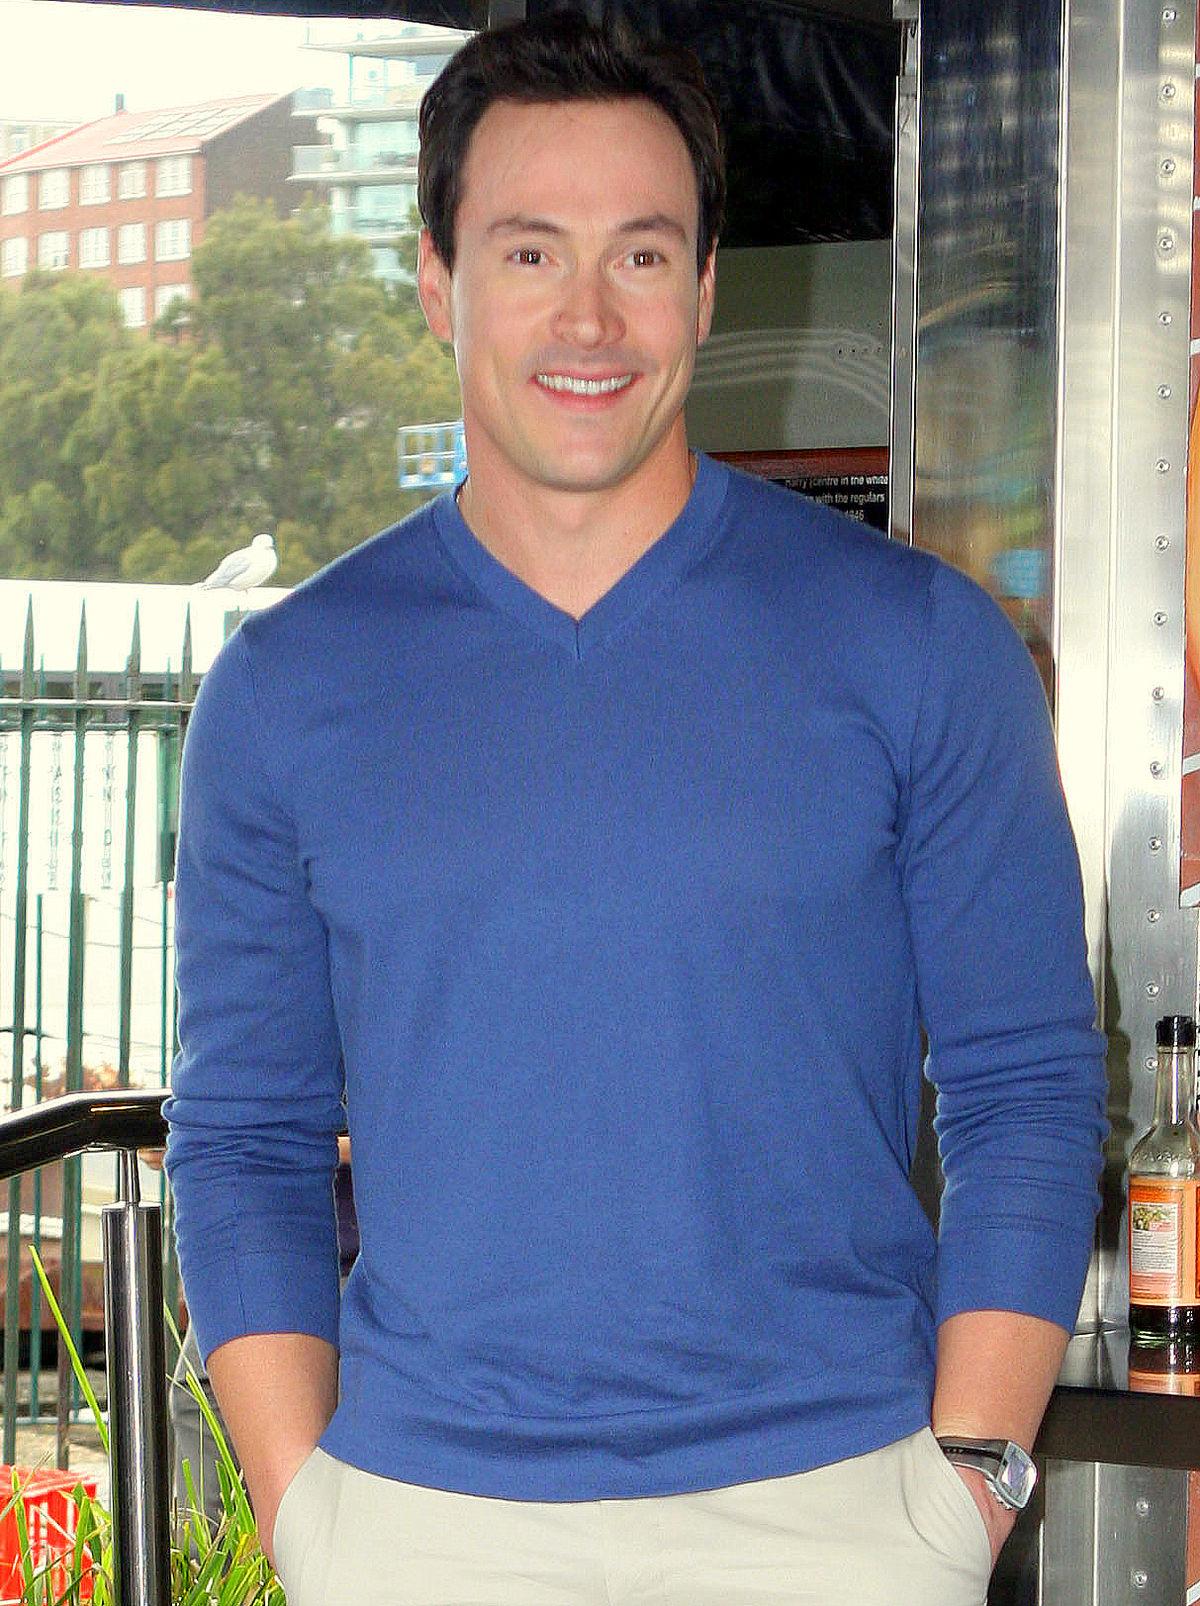 American actor Chris Klein 51